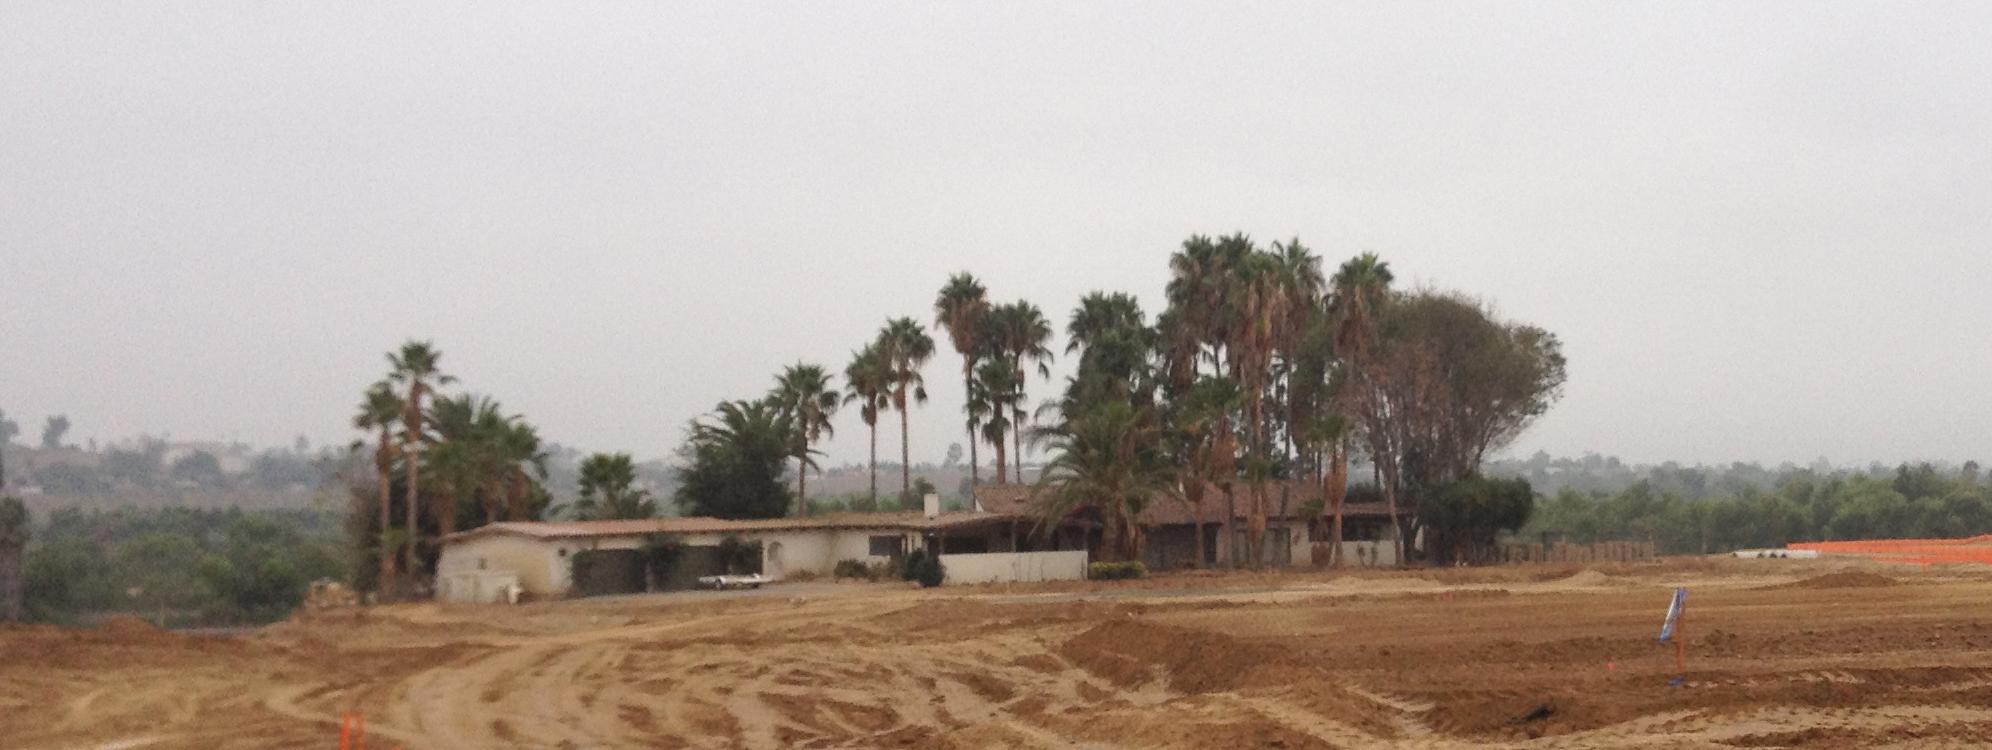 Historic desi arnaz house in eastvale abcpr media for Desi home pic